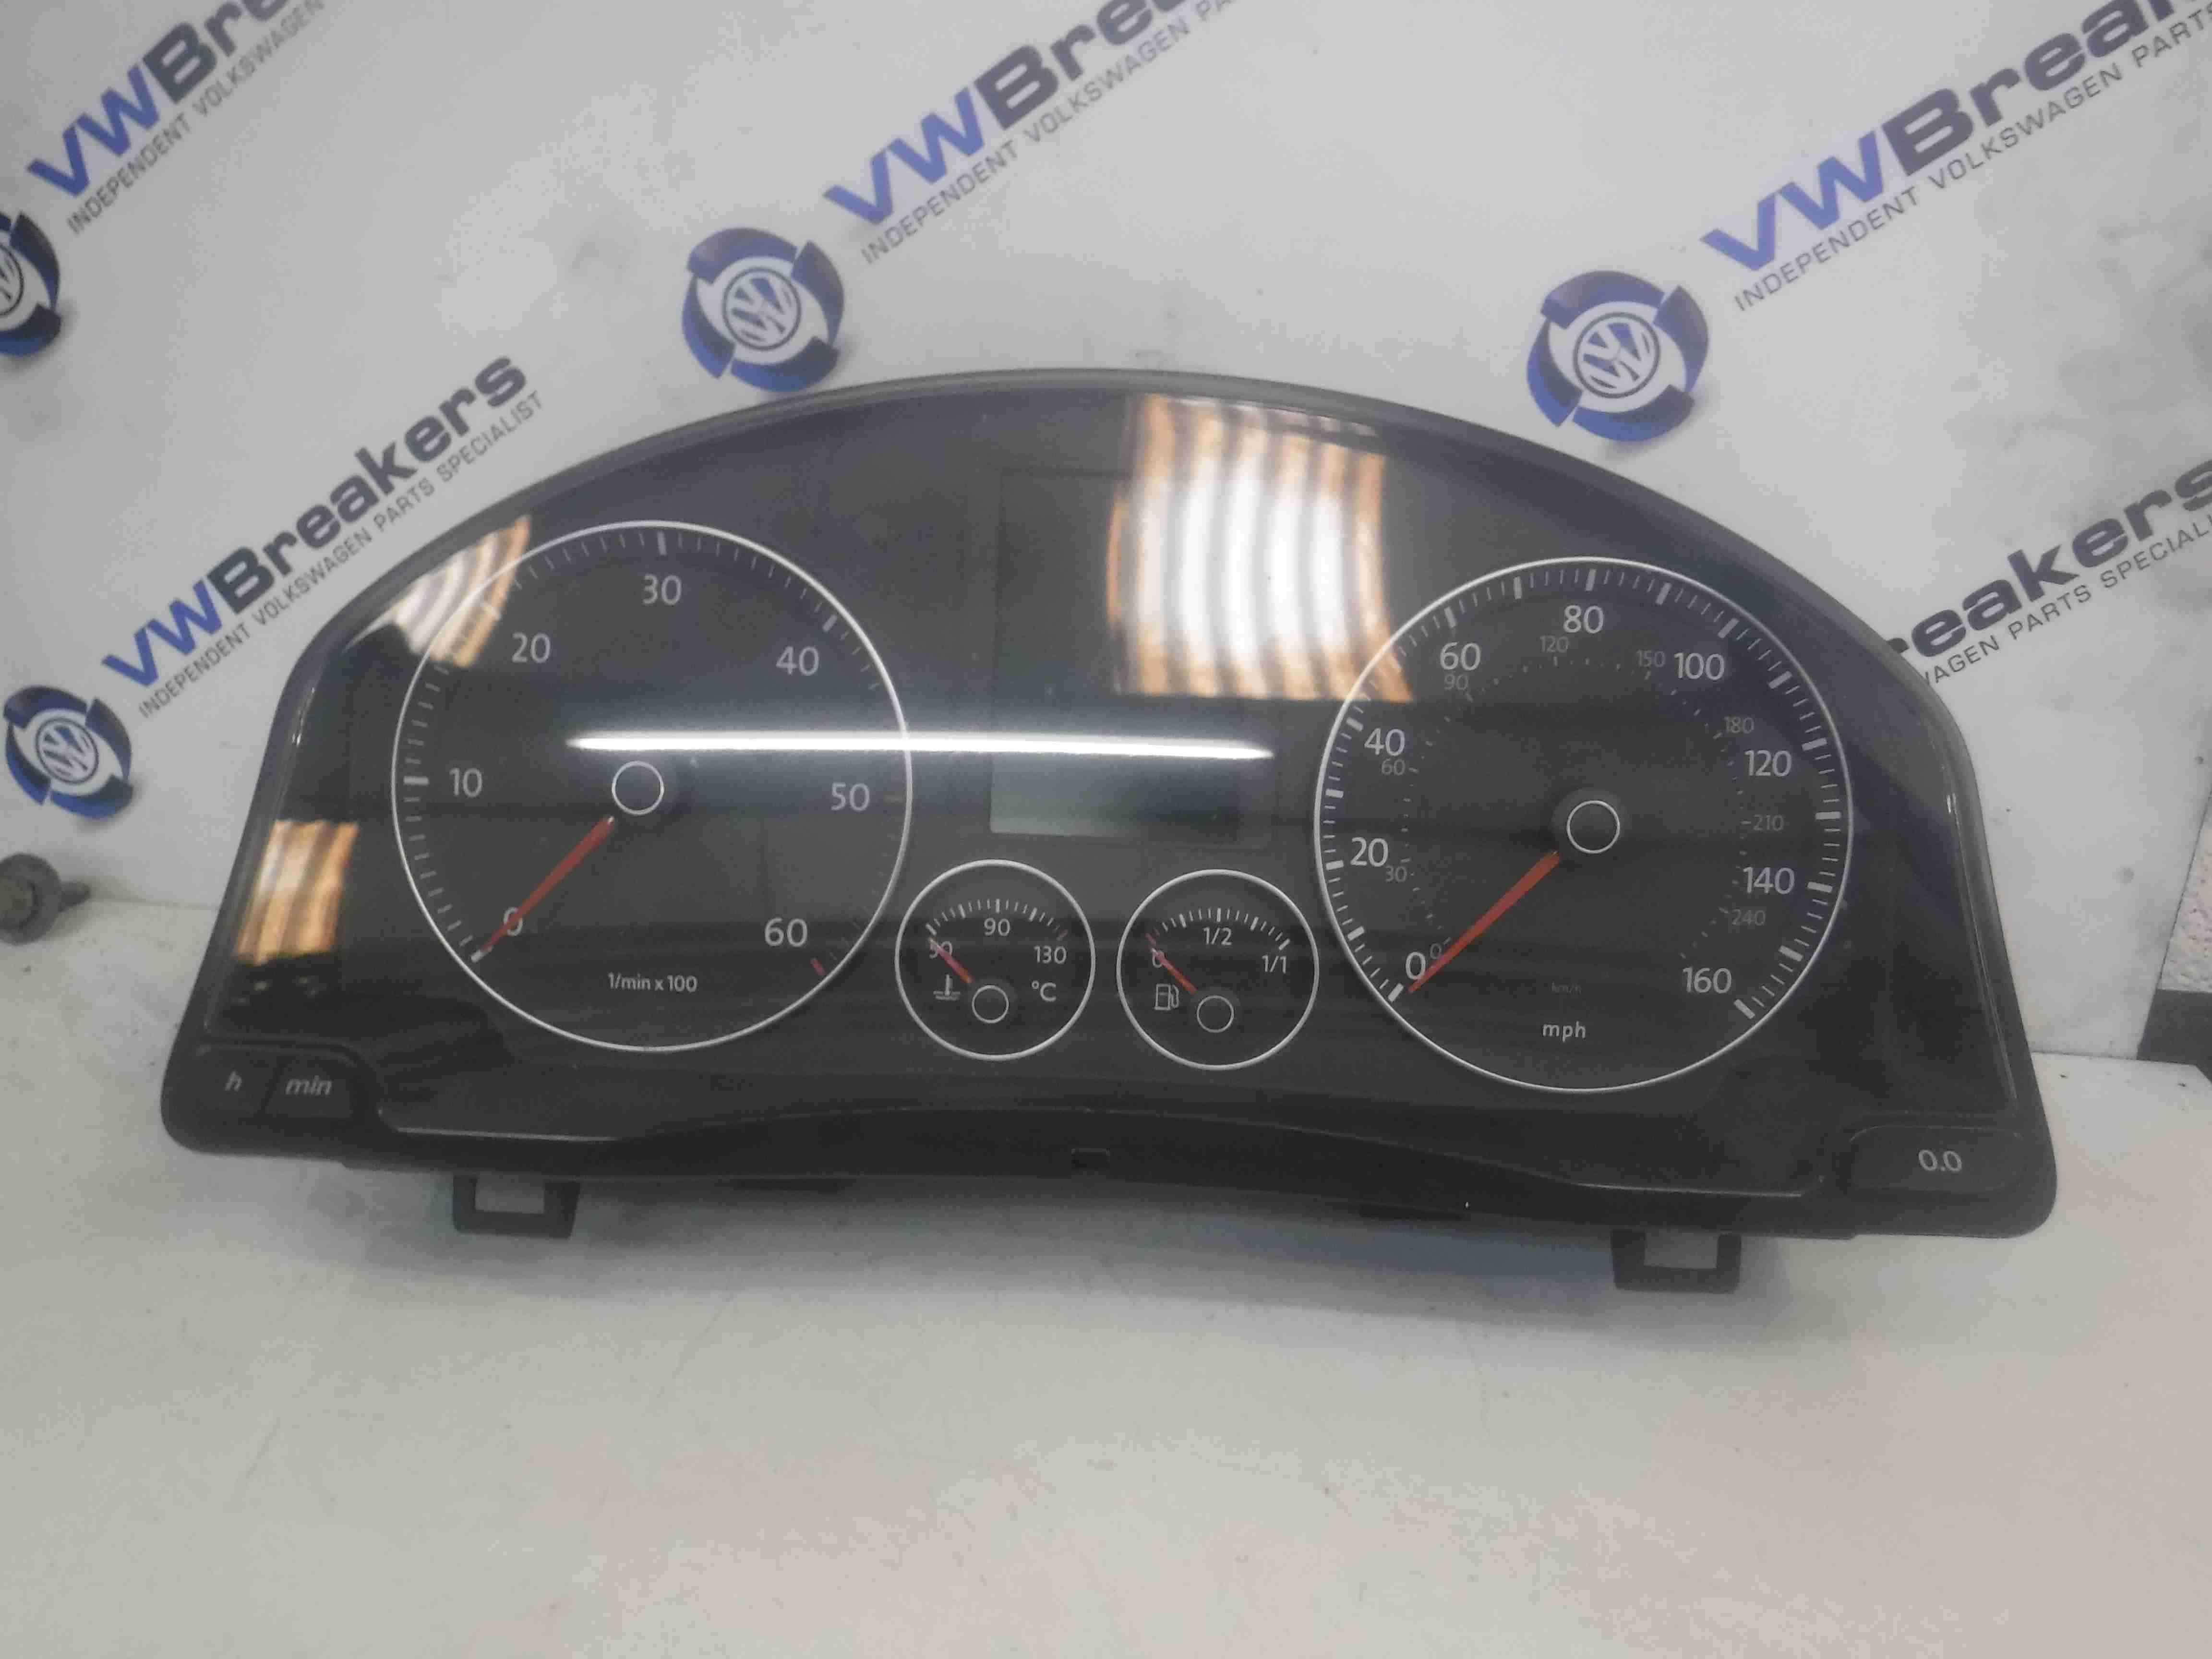 Volkswagen Golf MK5 2003-2009 Instrument Panel Dials Gauges Clocks 1K0920974B